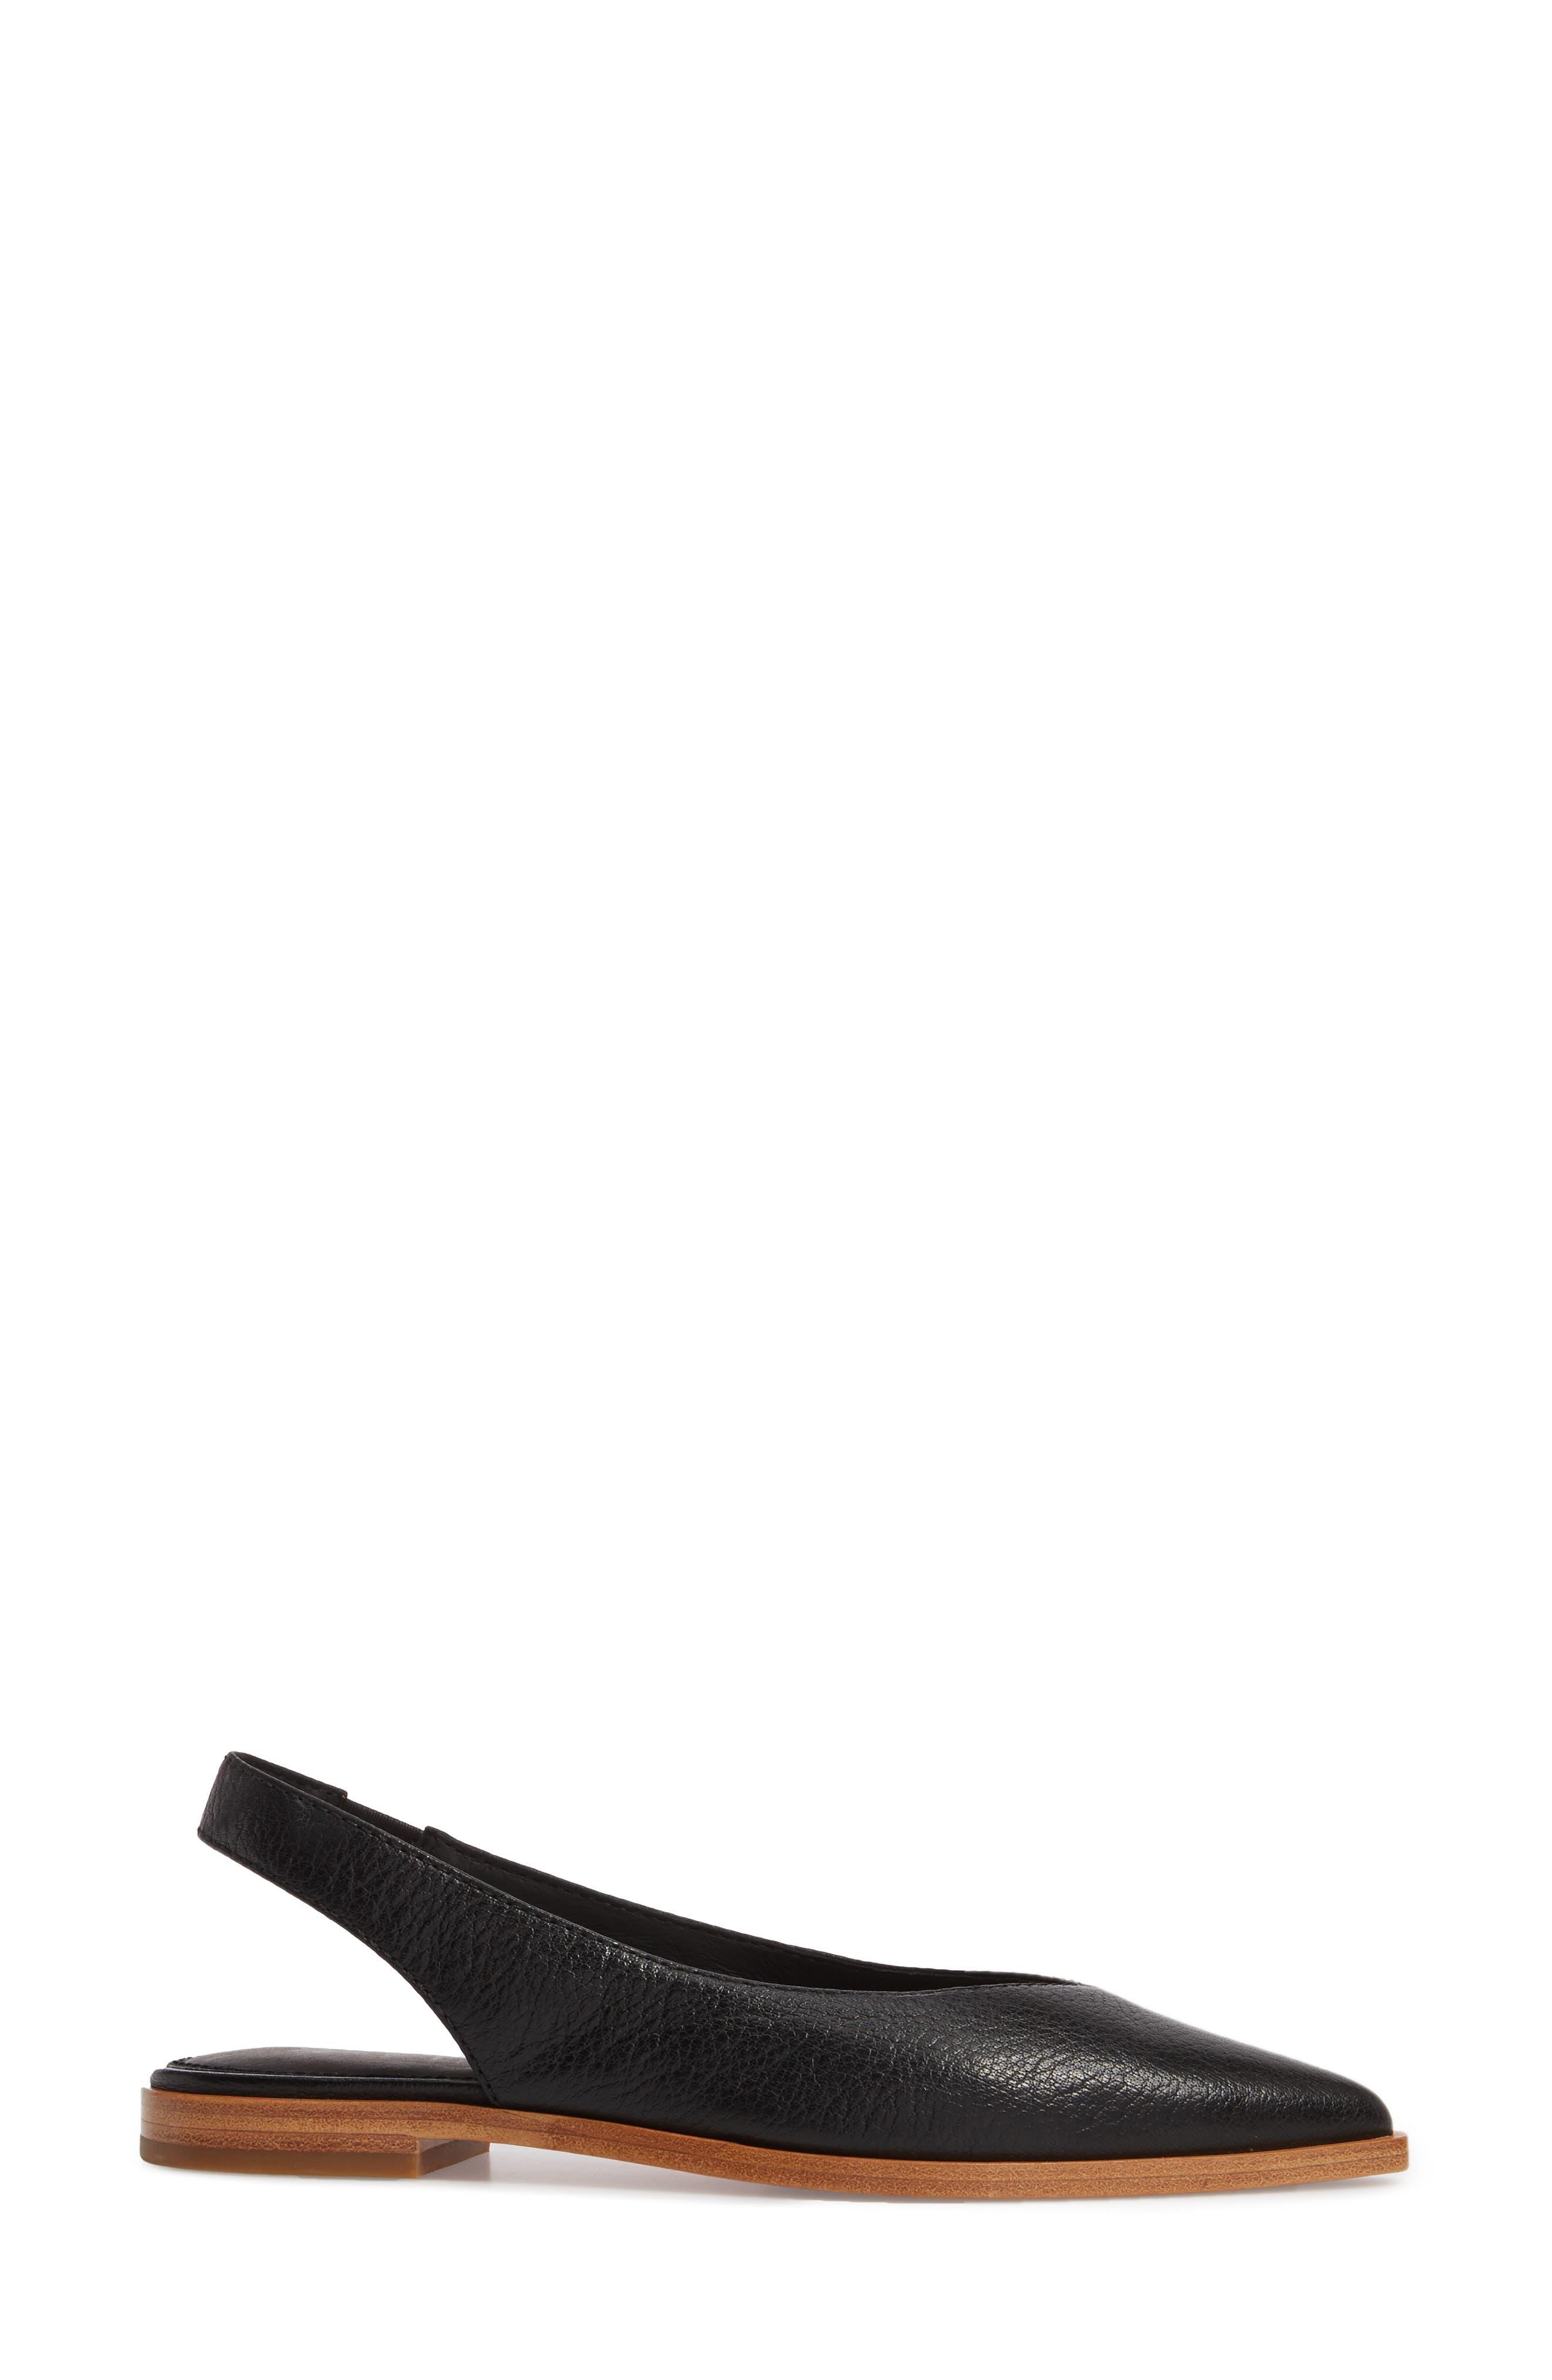 Kenzie Slingback Flat,                             Alternate thumbnail 3, color,                             Black Leather